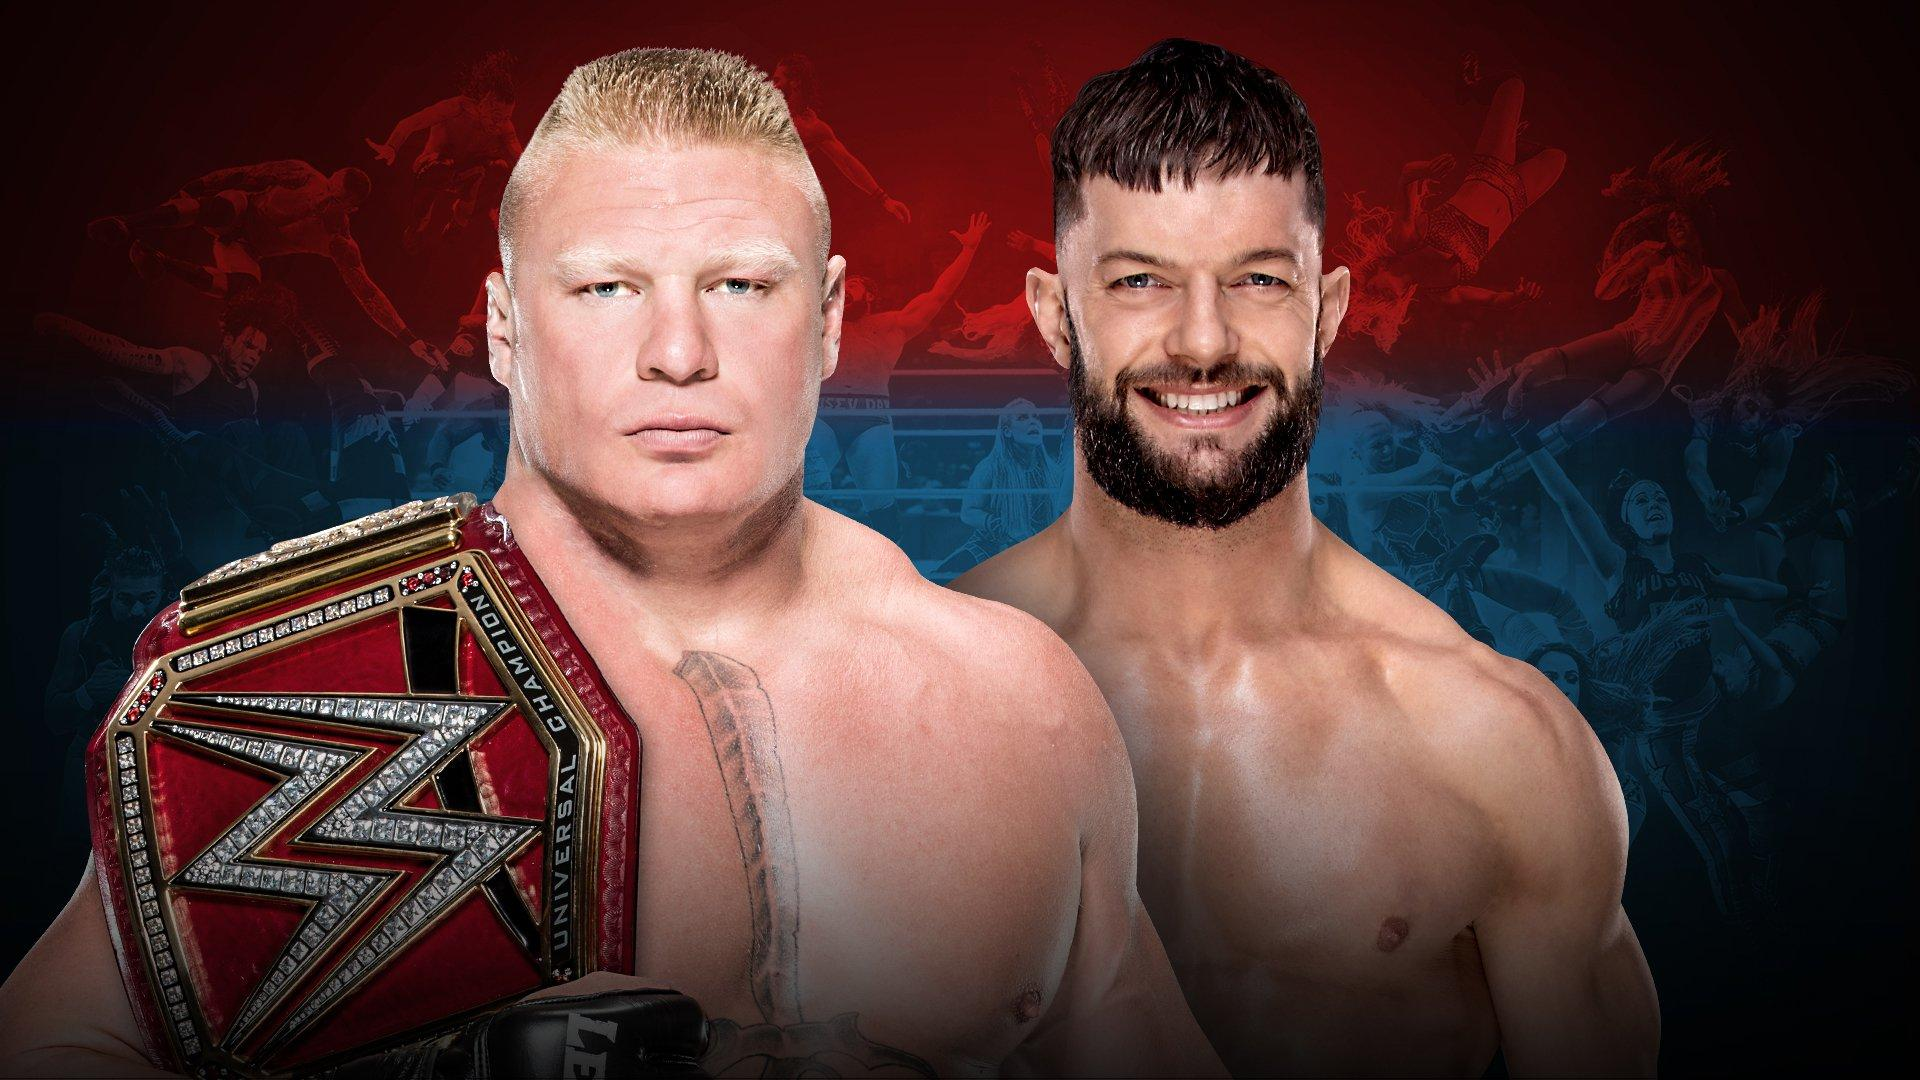 A stacked WWE Royal Rumble card adds Brock Lesnar vs Finn Balor